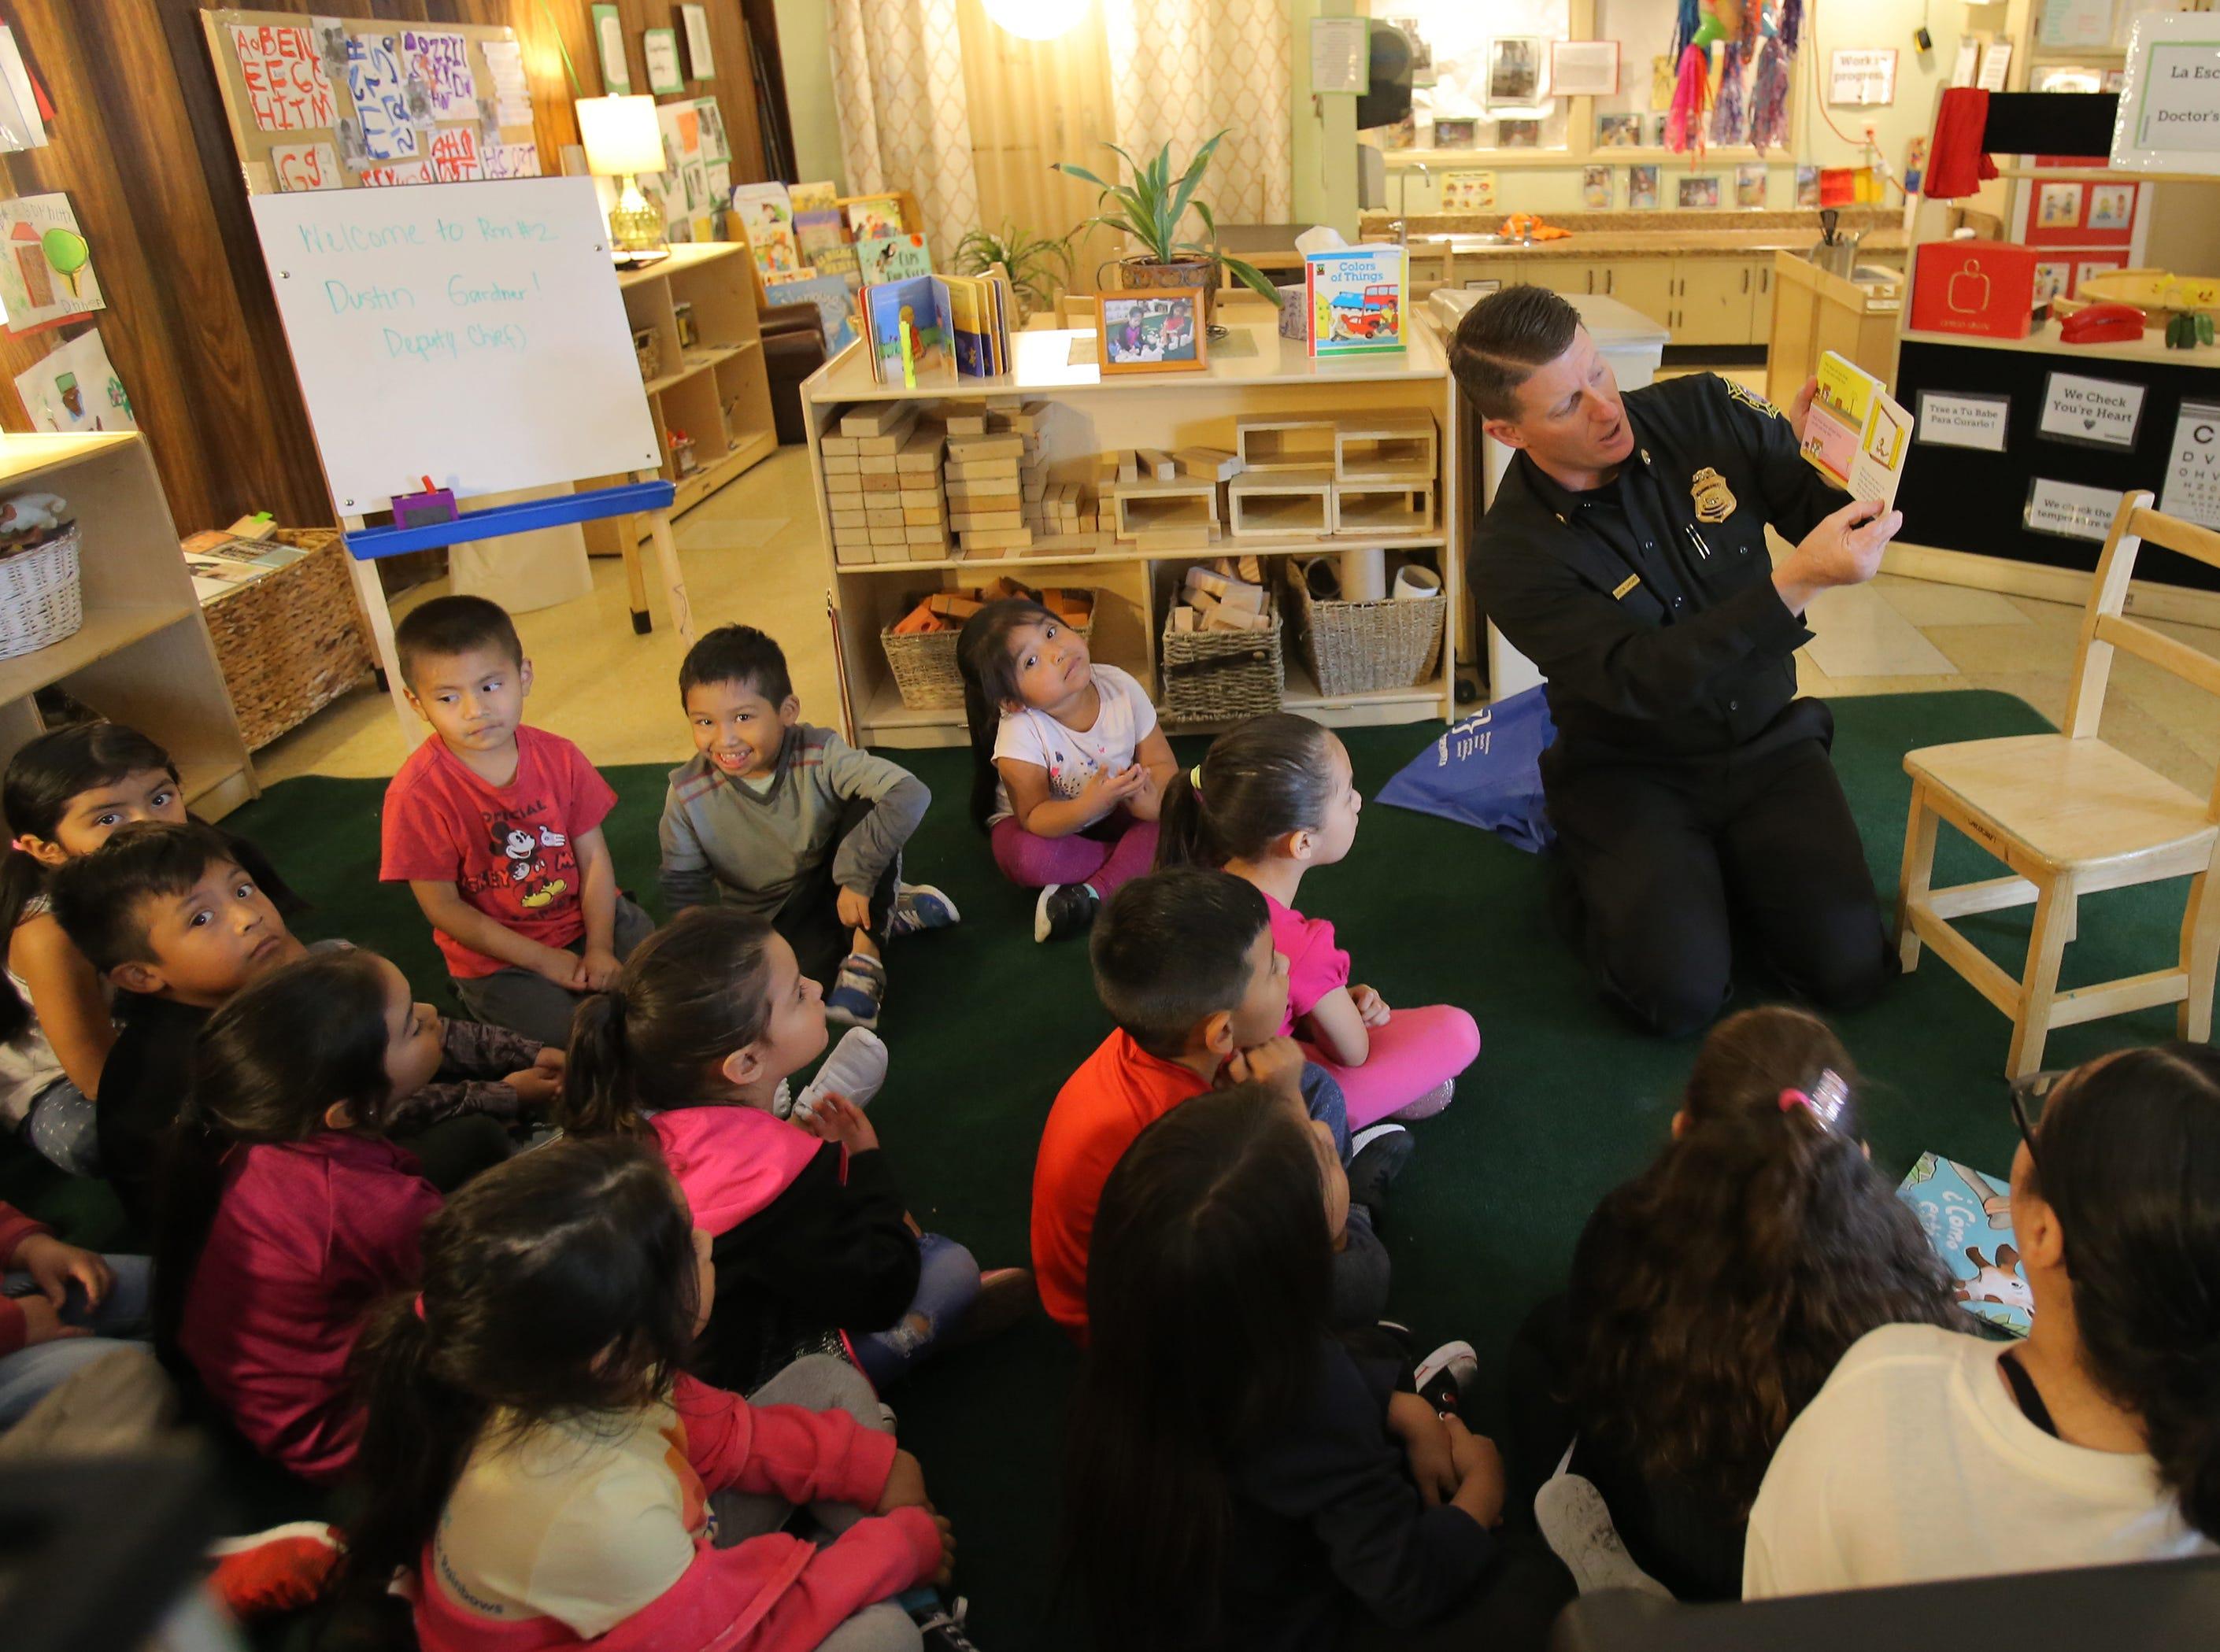 Ventura County Fire Deputy Chief Dustin Gardner reads to preschoolers during the fourth annual Take 5 and Read to Kids campaign at La Escuelita Child Development Center in Oxnard.